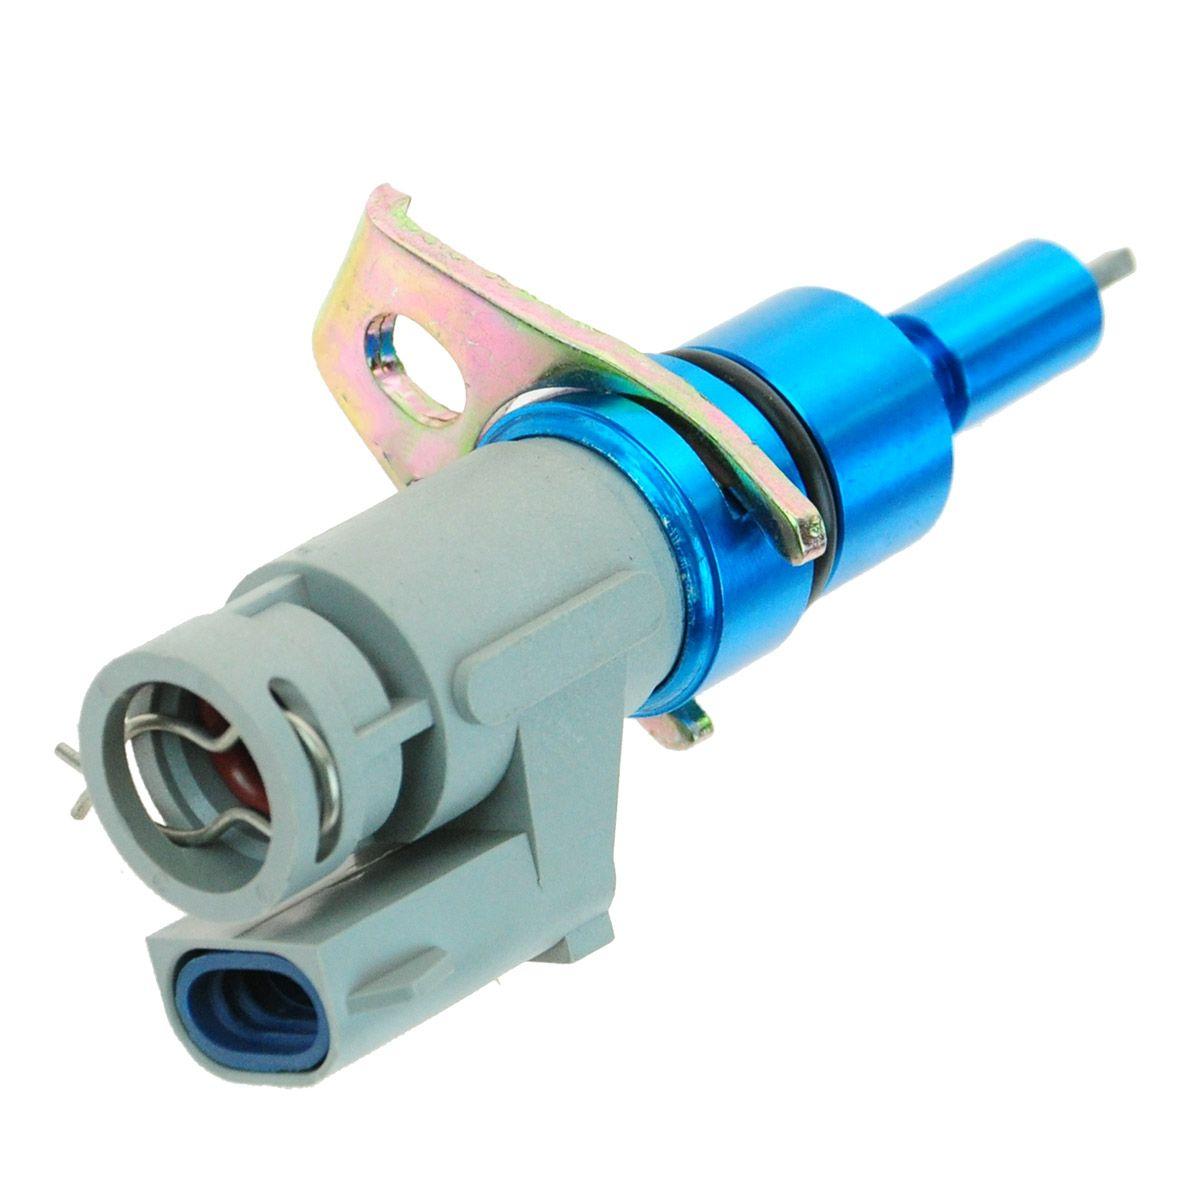 Vehicle Transmission Speed Sensor VSS for Ford Lincoln Mercury